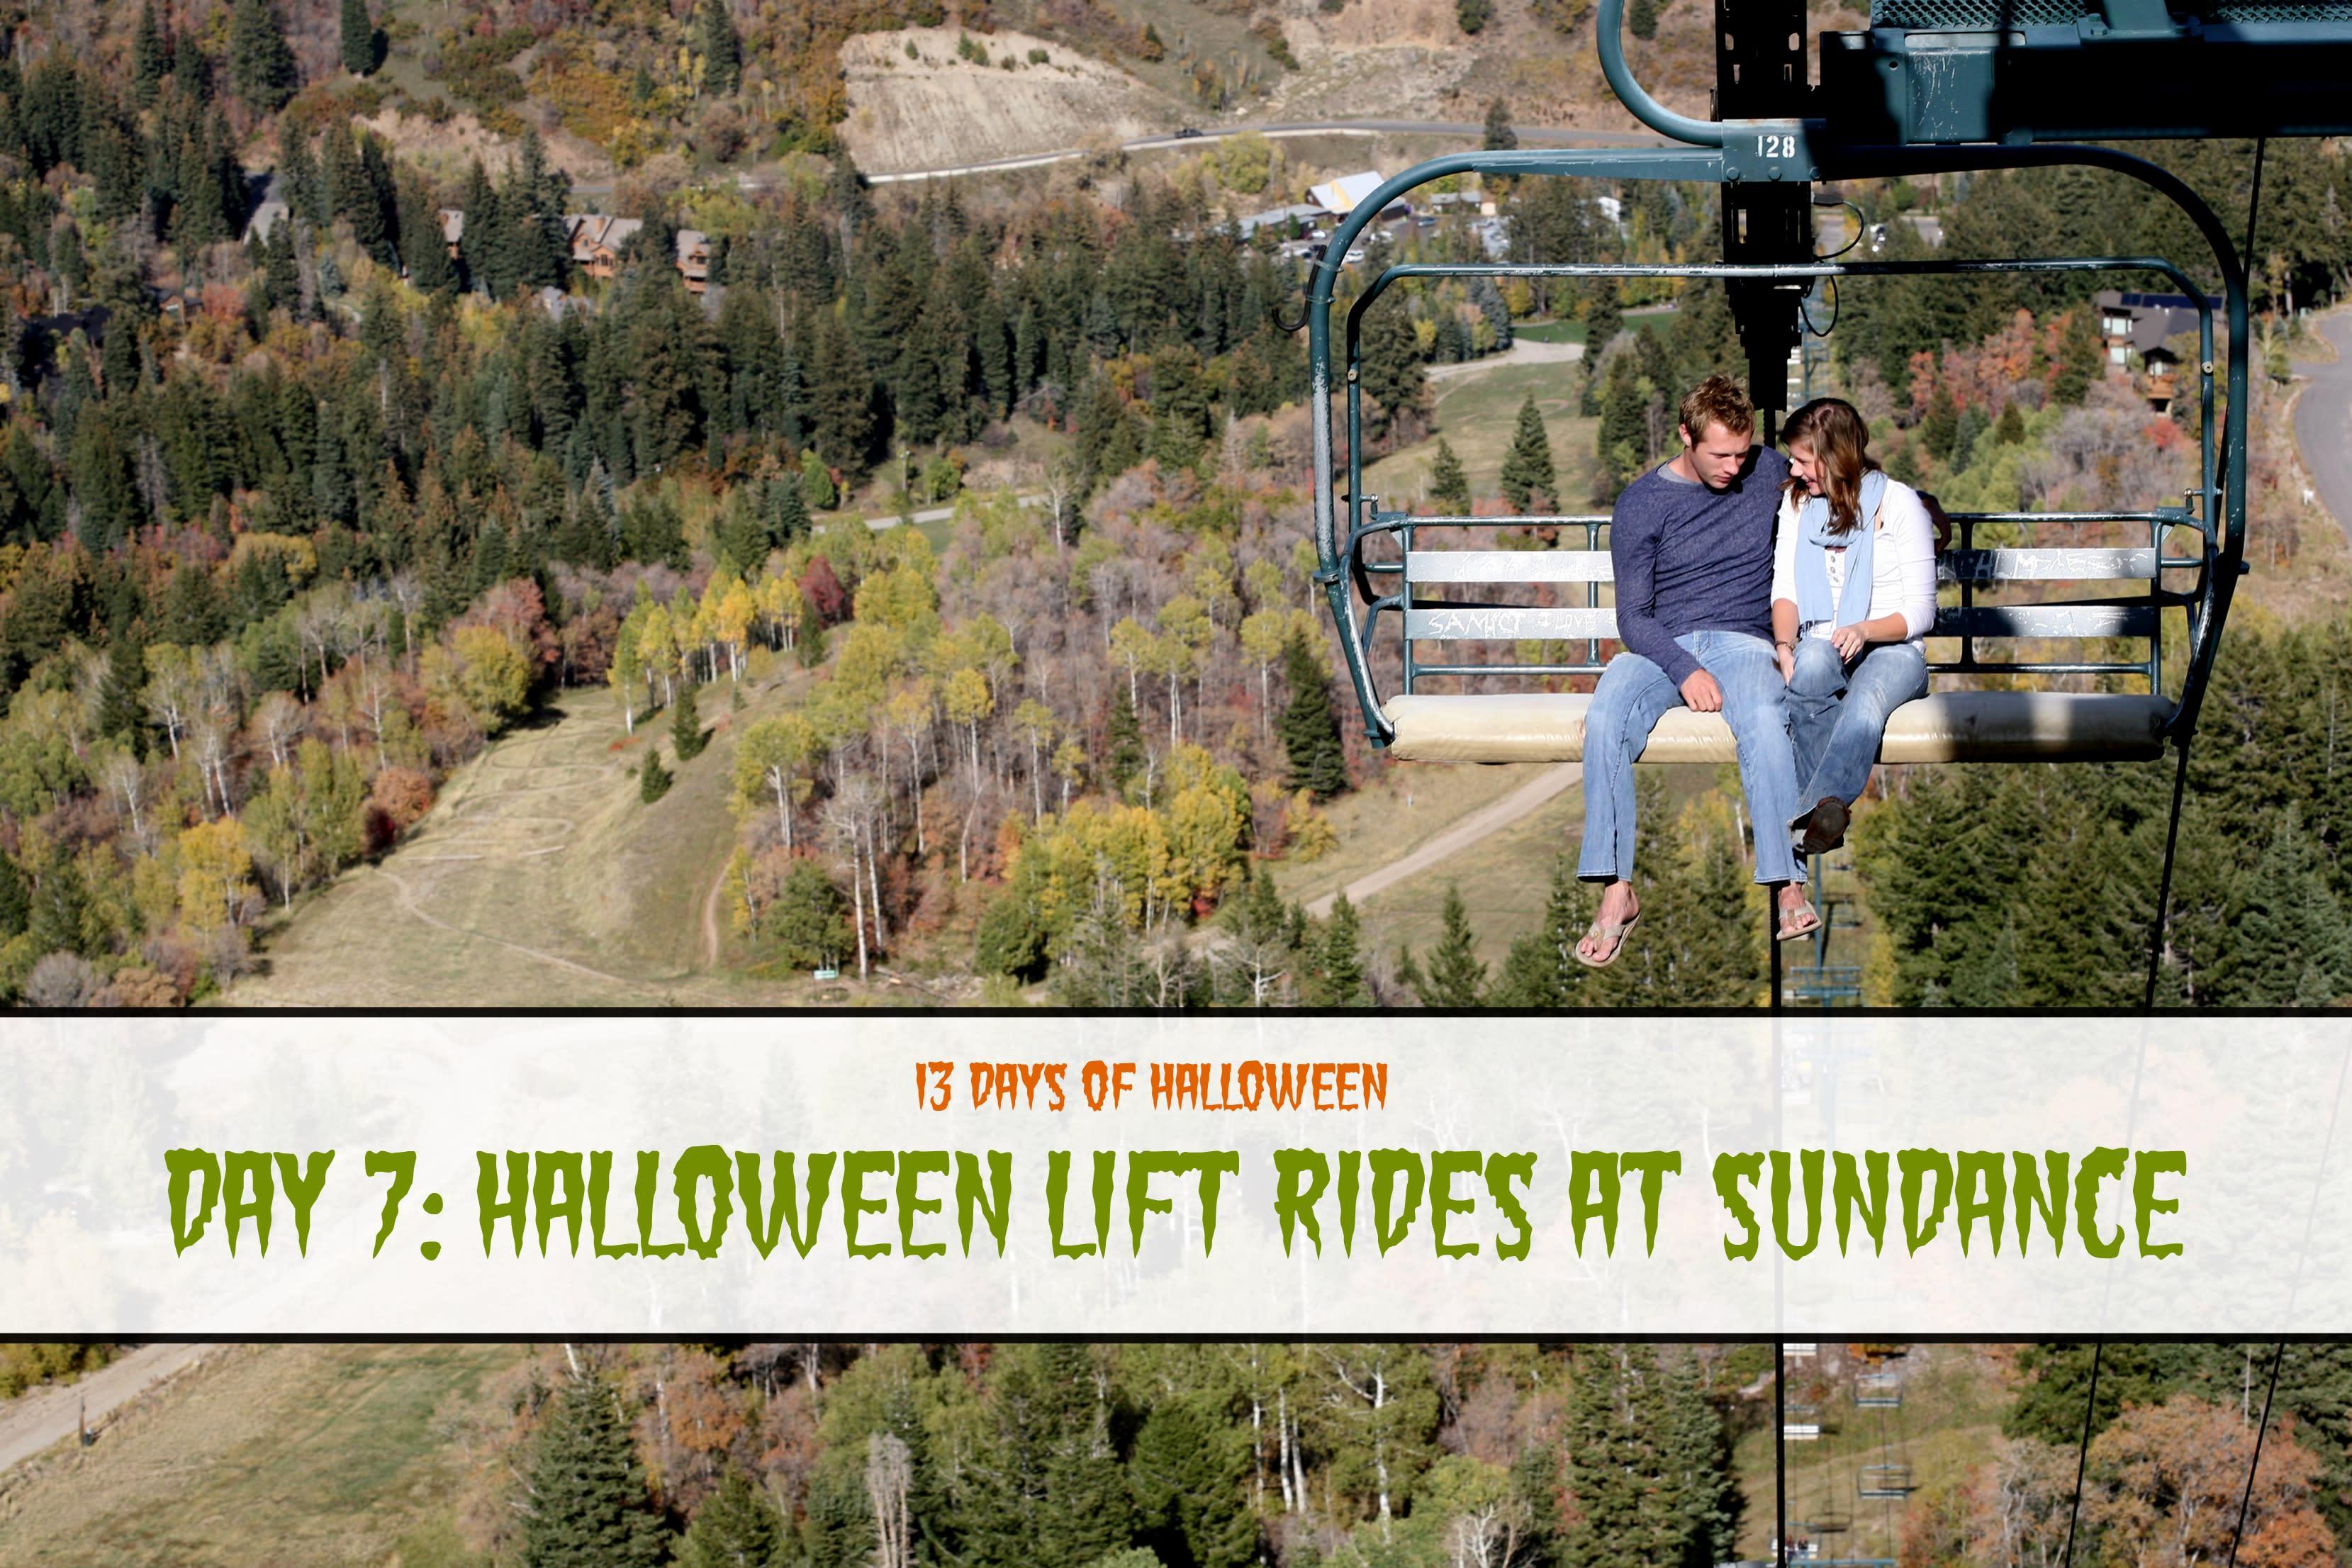 Day 7: Halloween Lift Ride